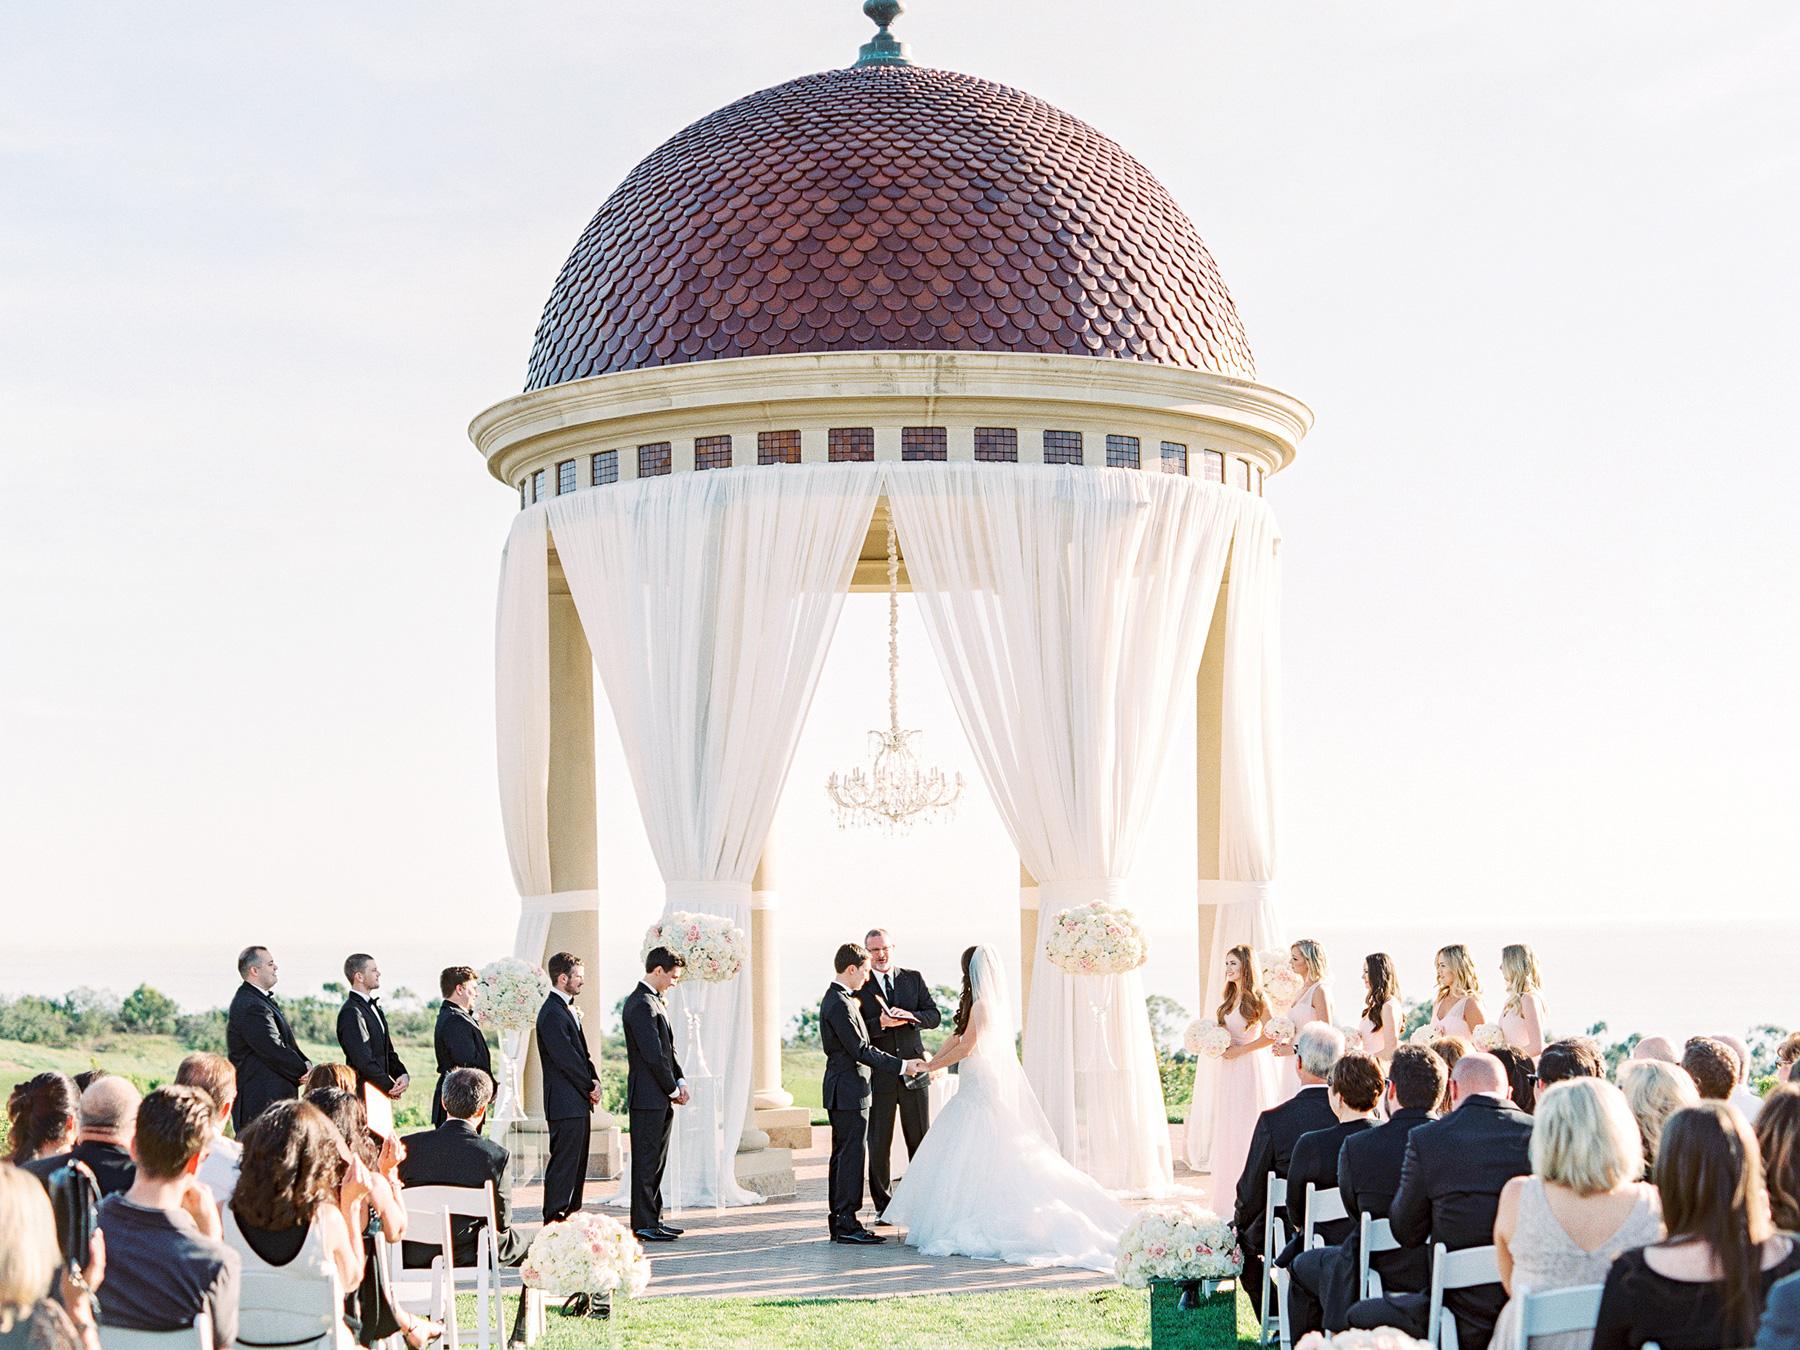 Pelican-hill-wedding-15.JPG